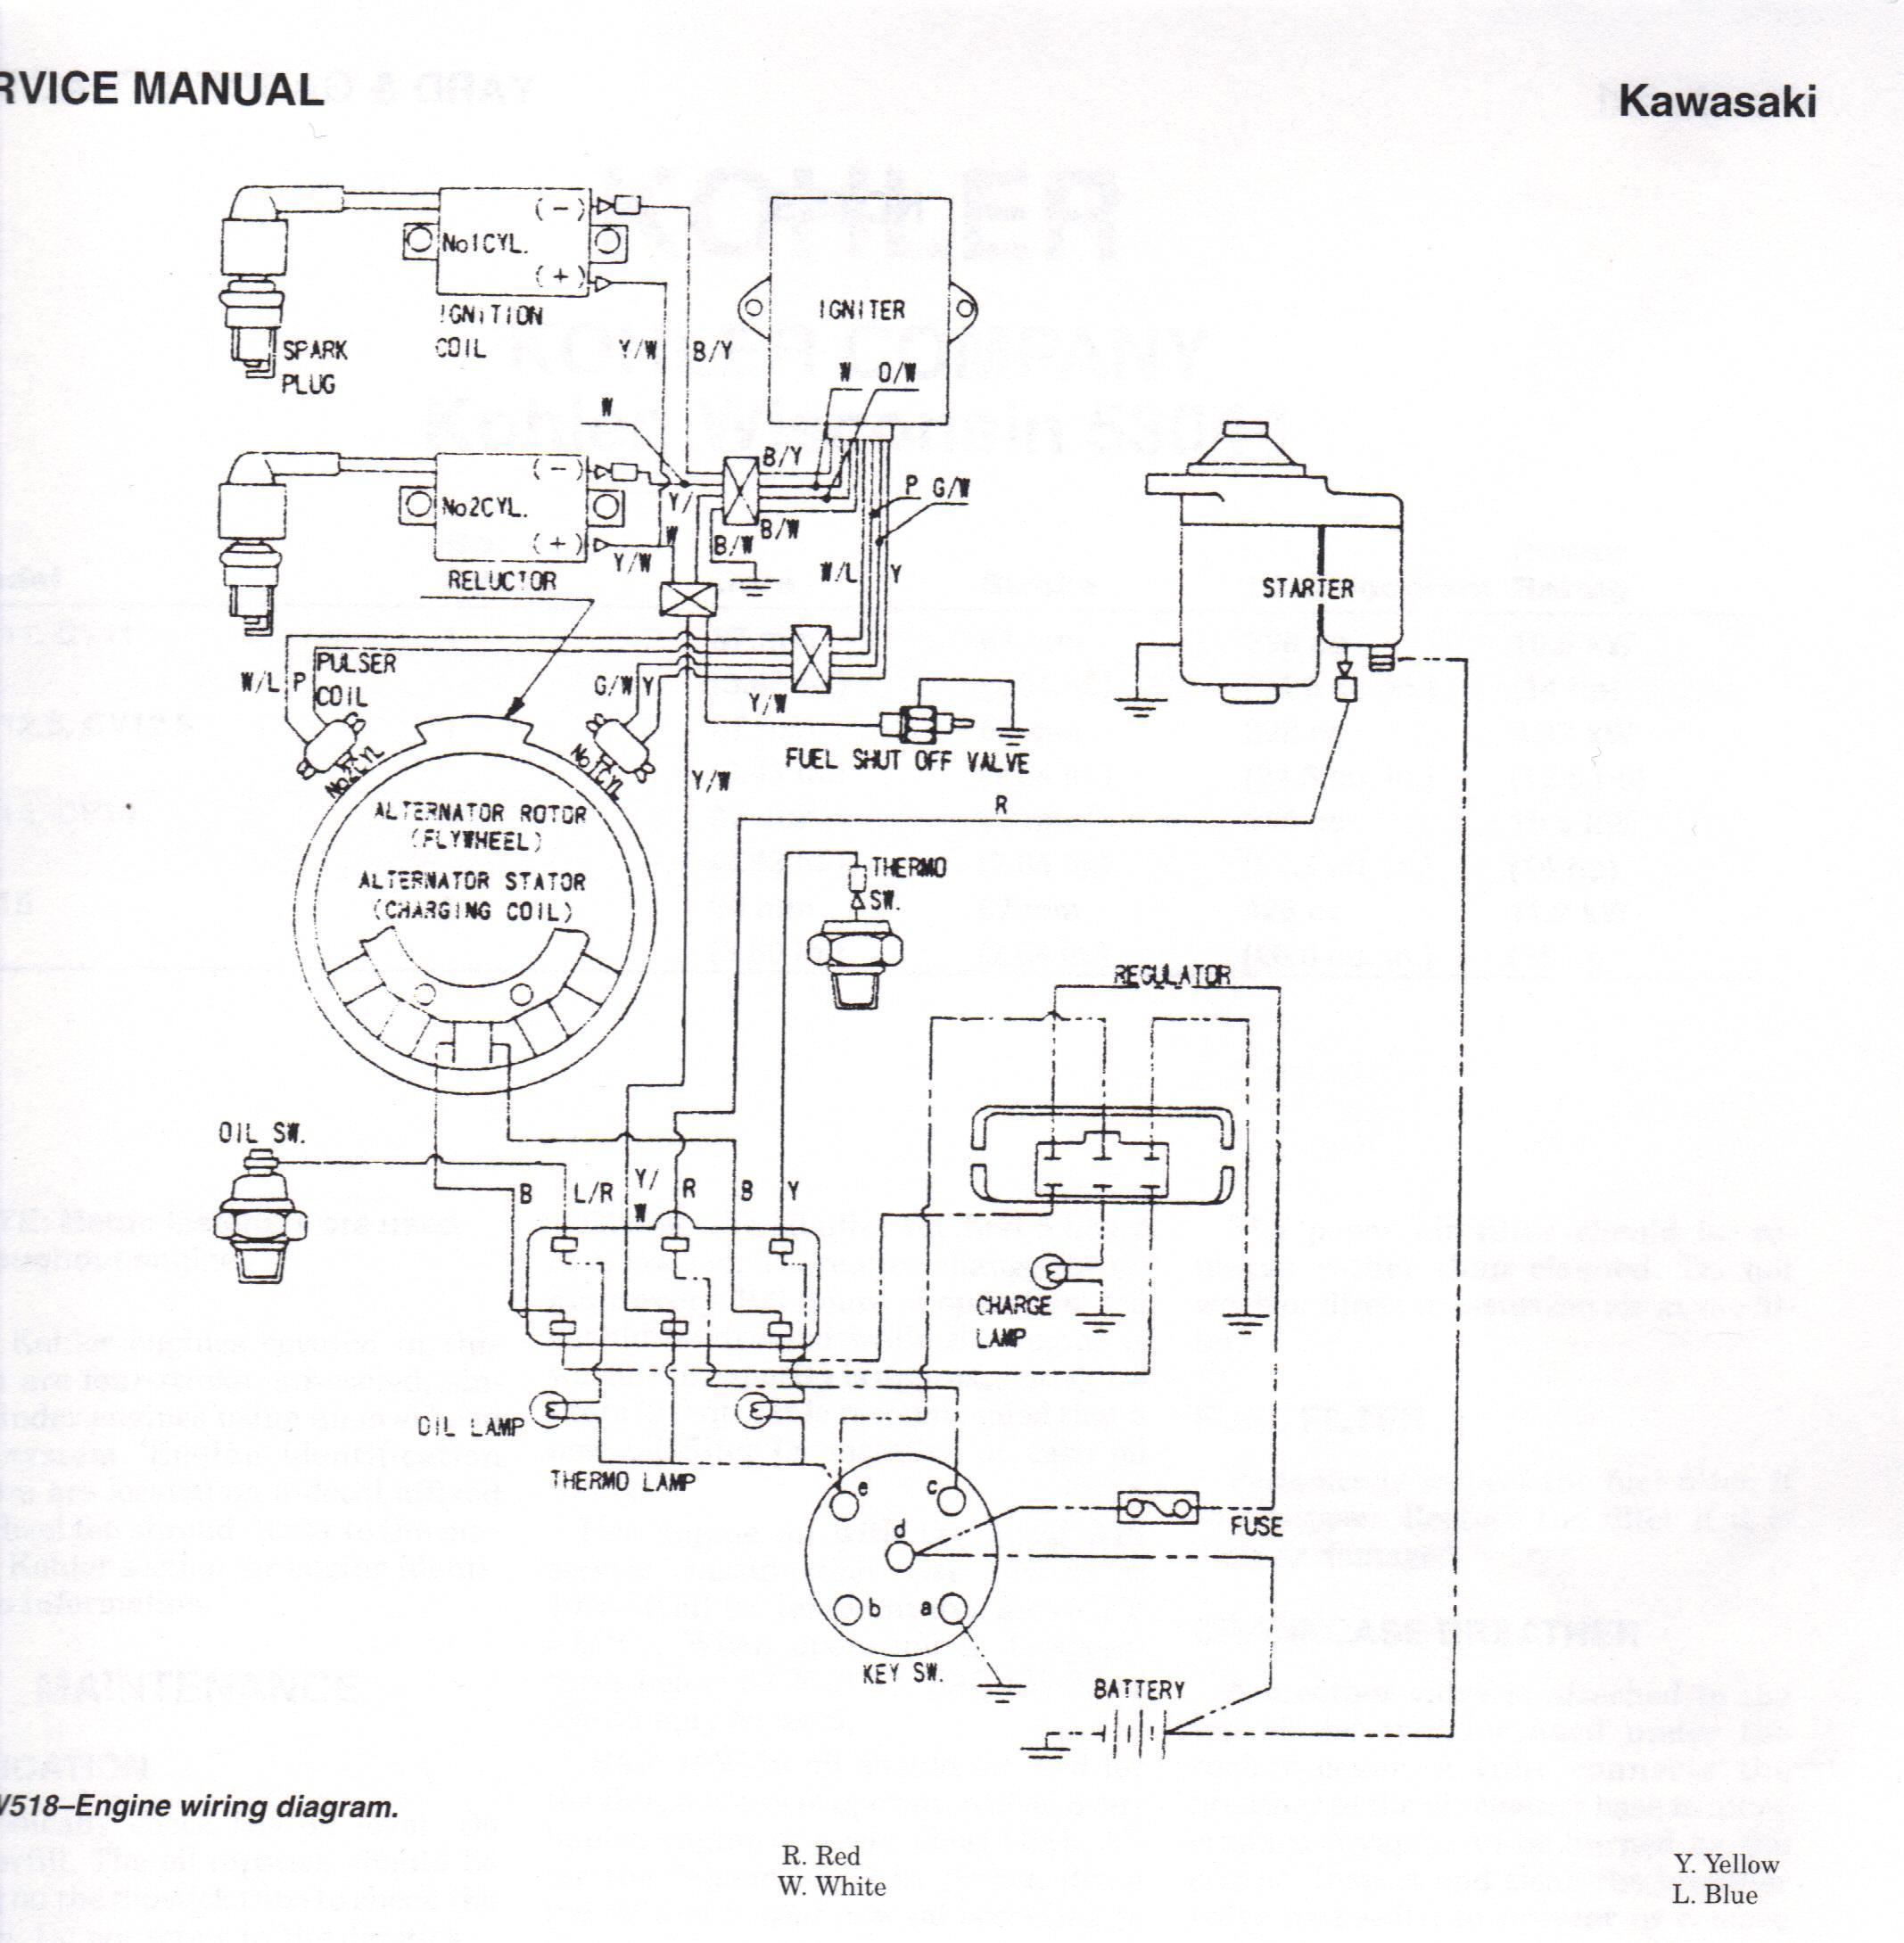 John Deere F510 Wiring Diagram Seniorsclub It Visualdraw Field Visualdraw Field Seniorsclub It